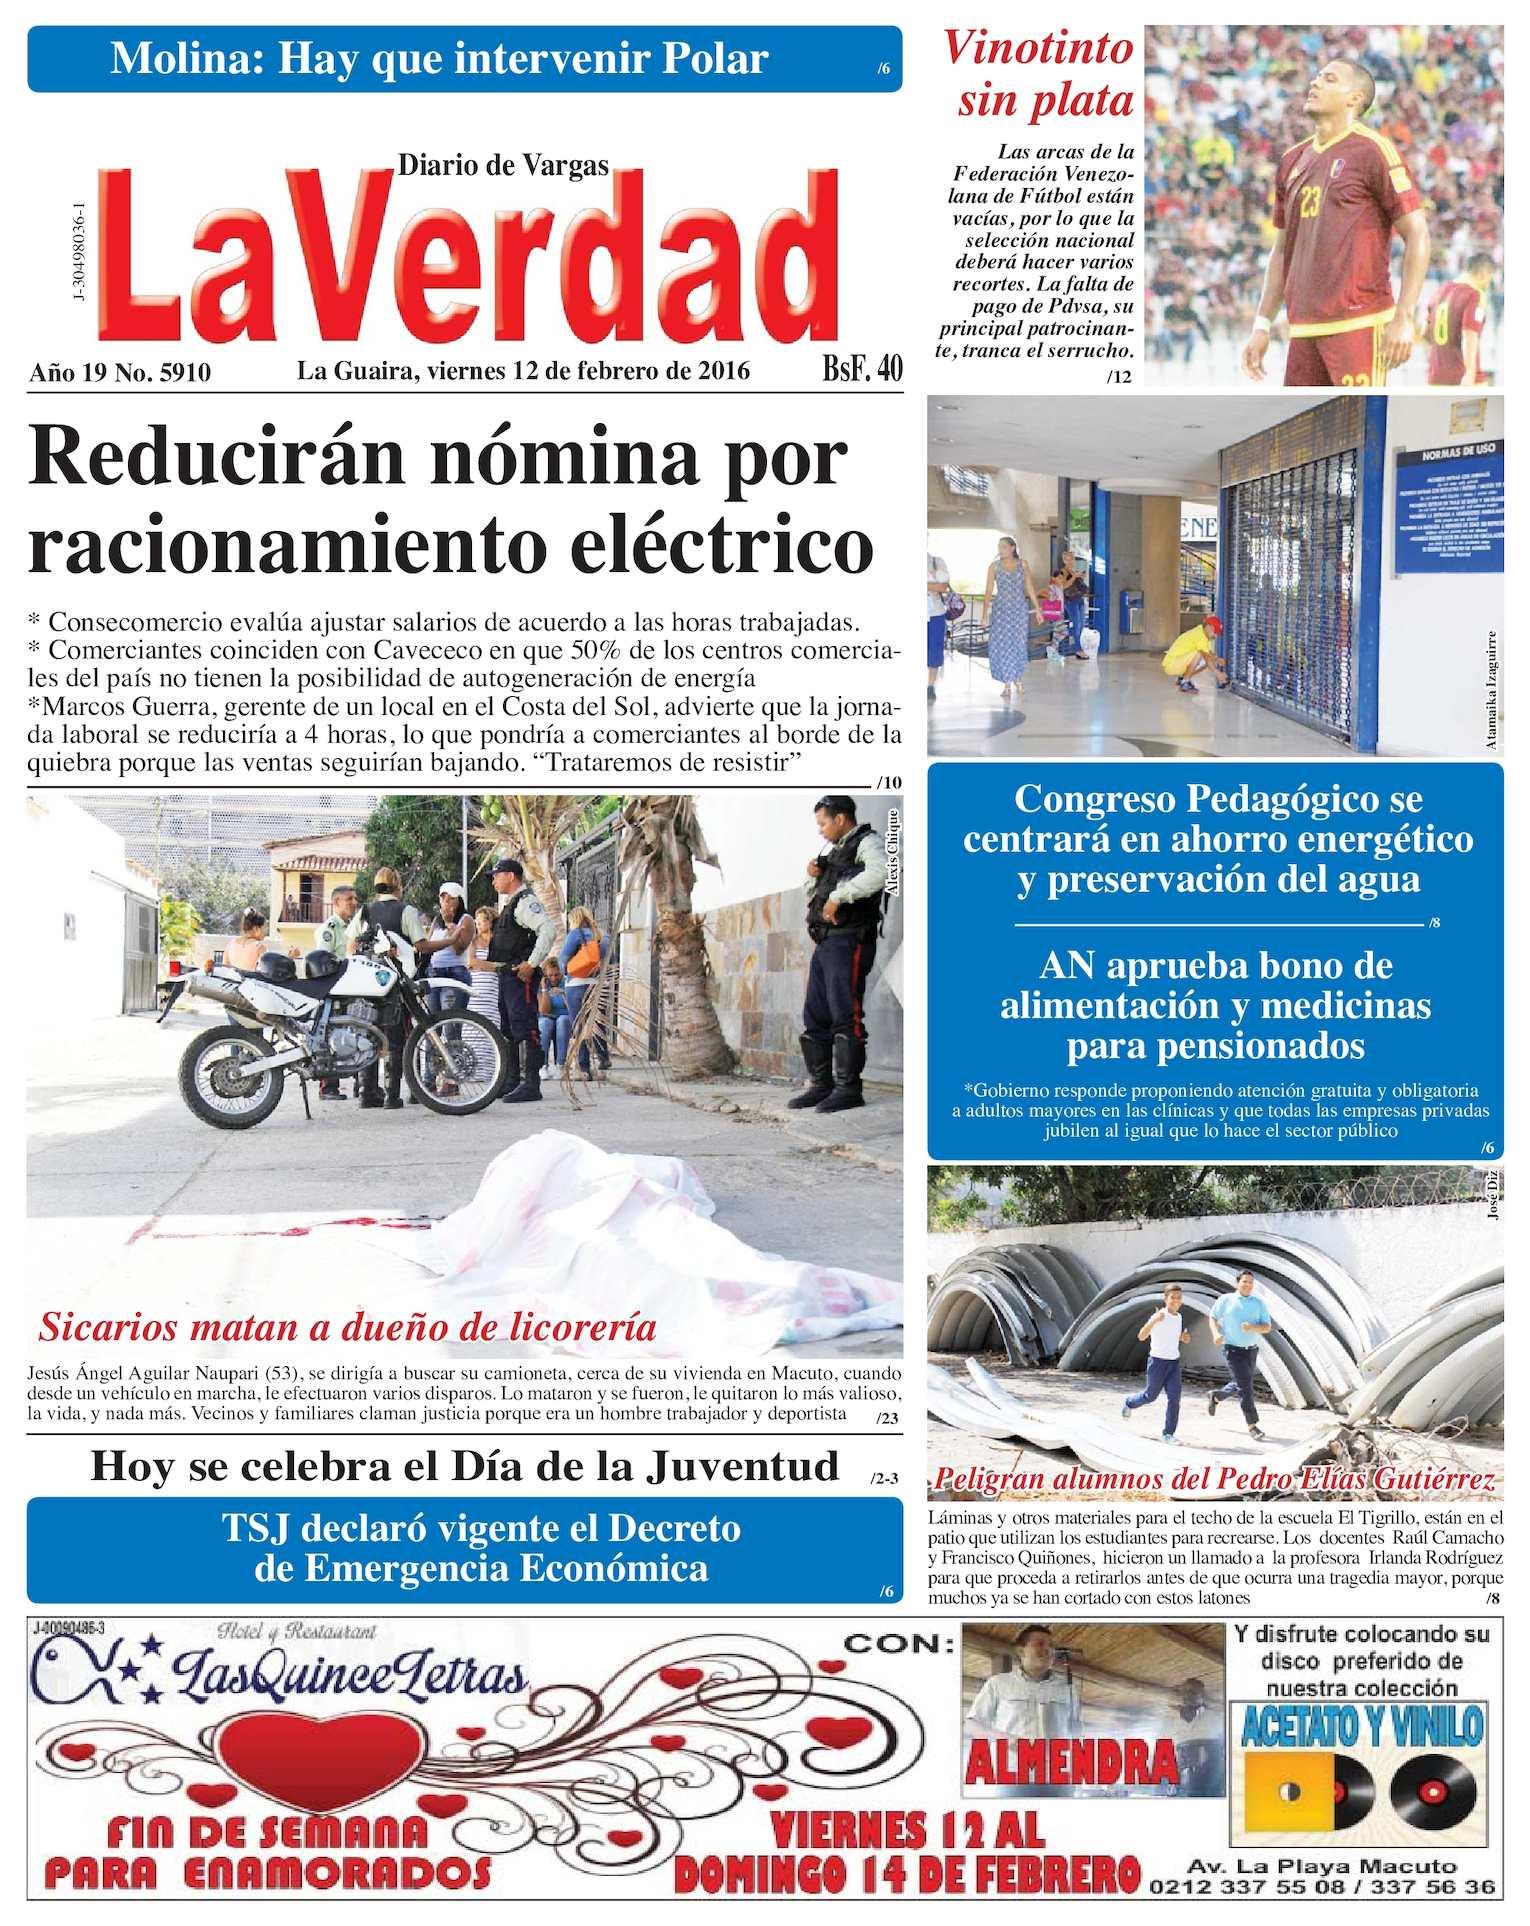 Calaméo - La Guaira, viernes 12 de febrero de 2016 Año 19 Nº. 5910